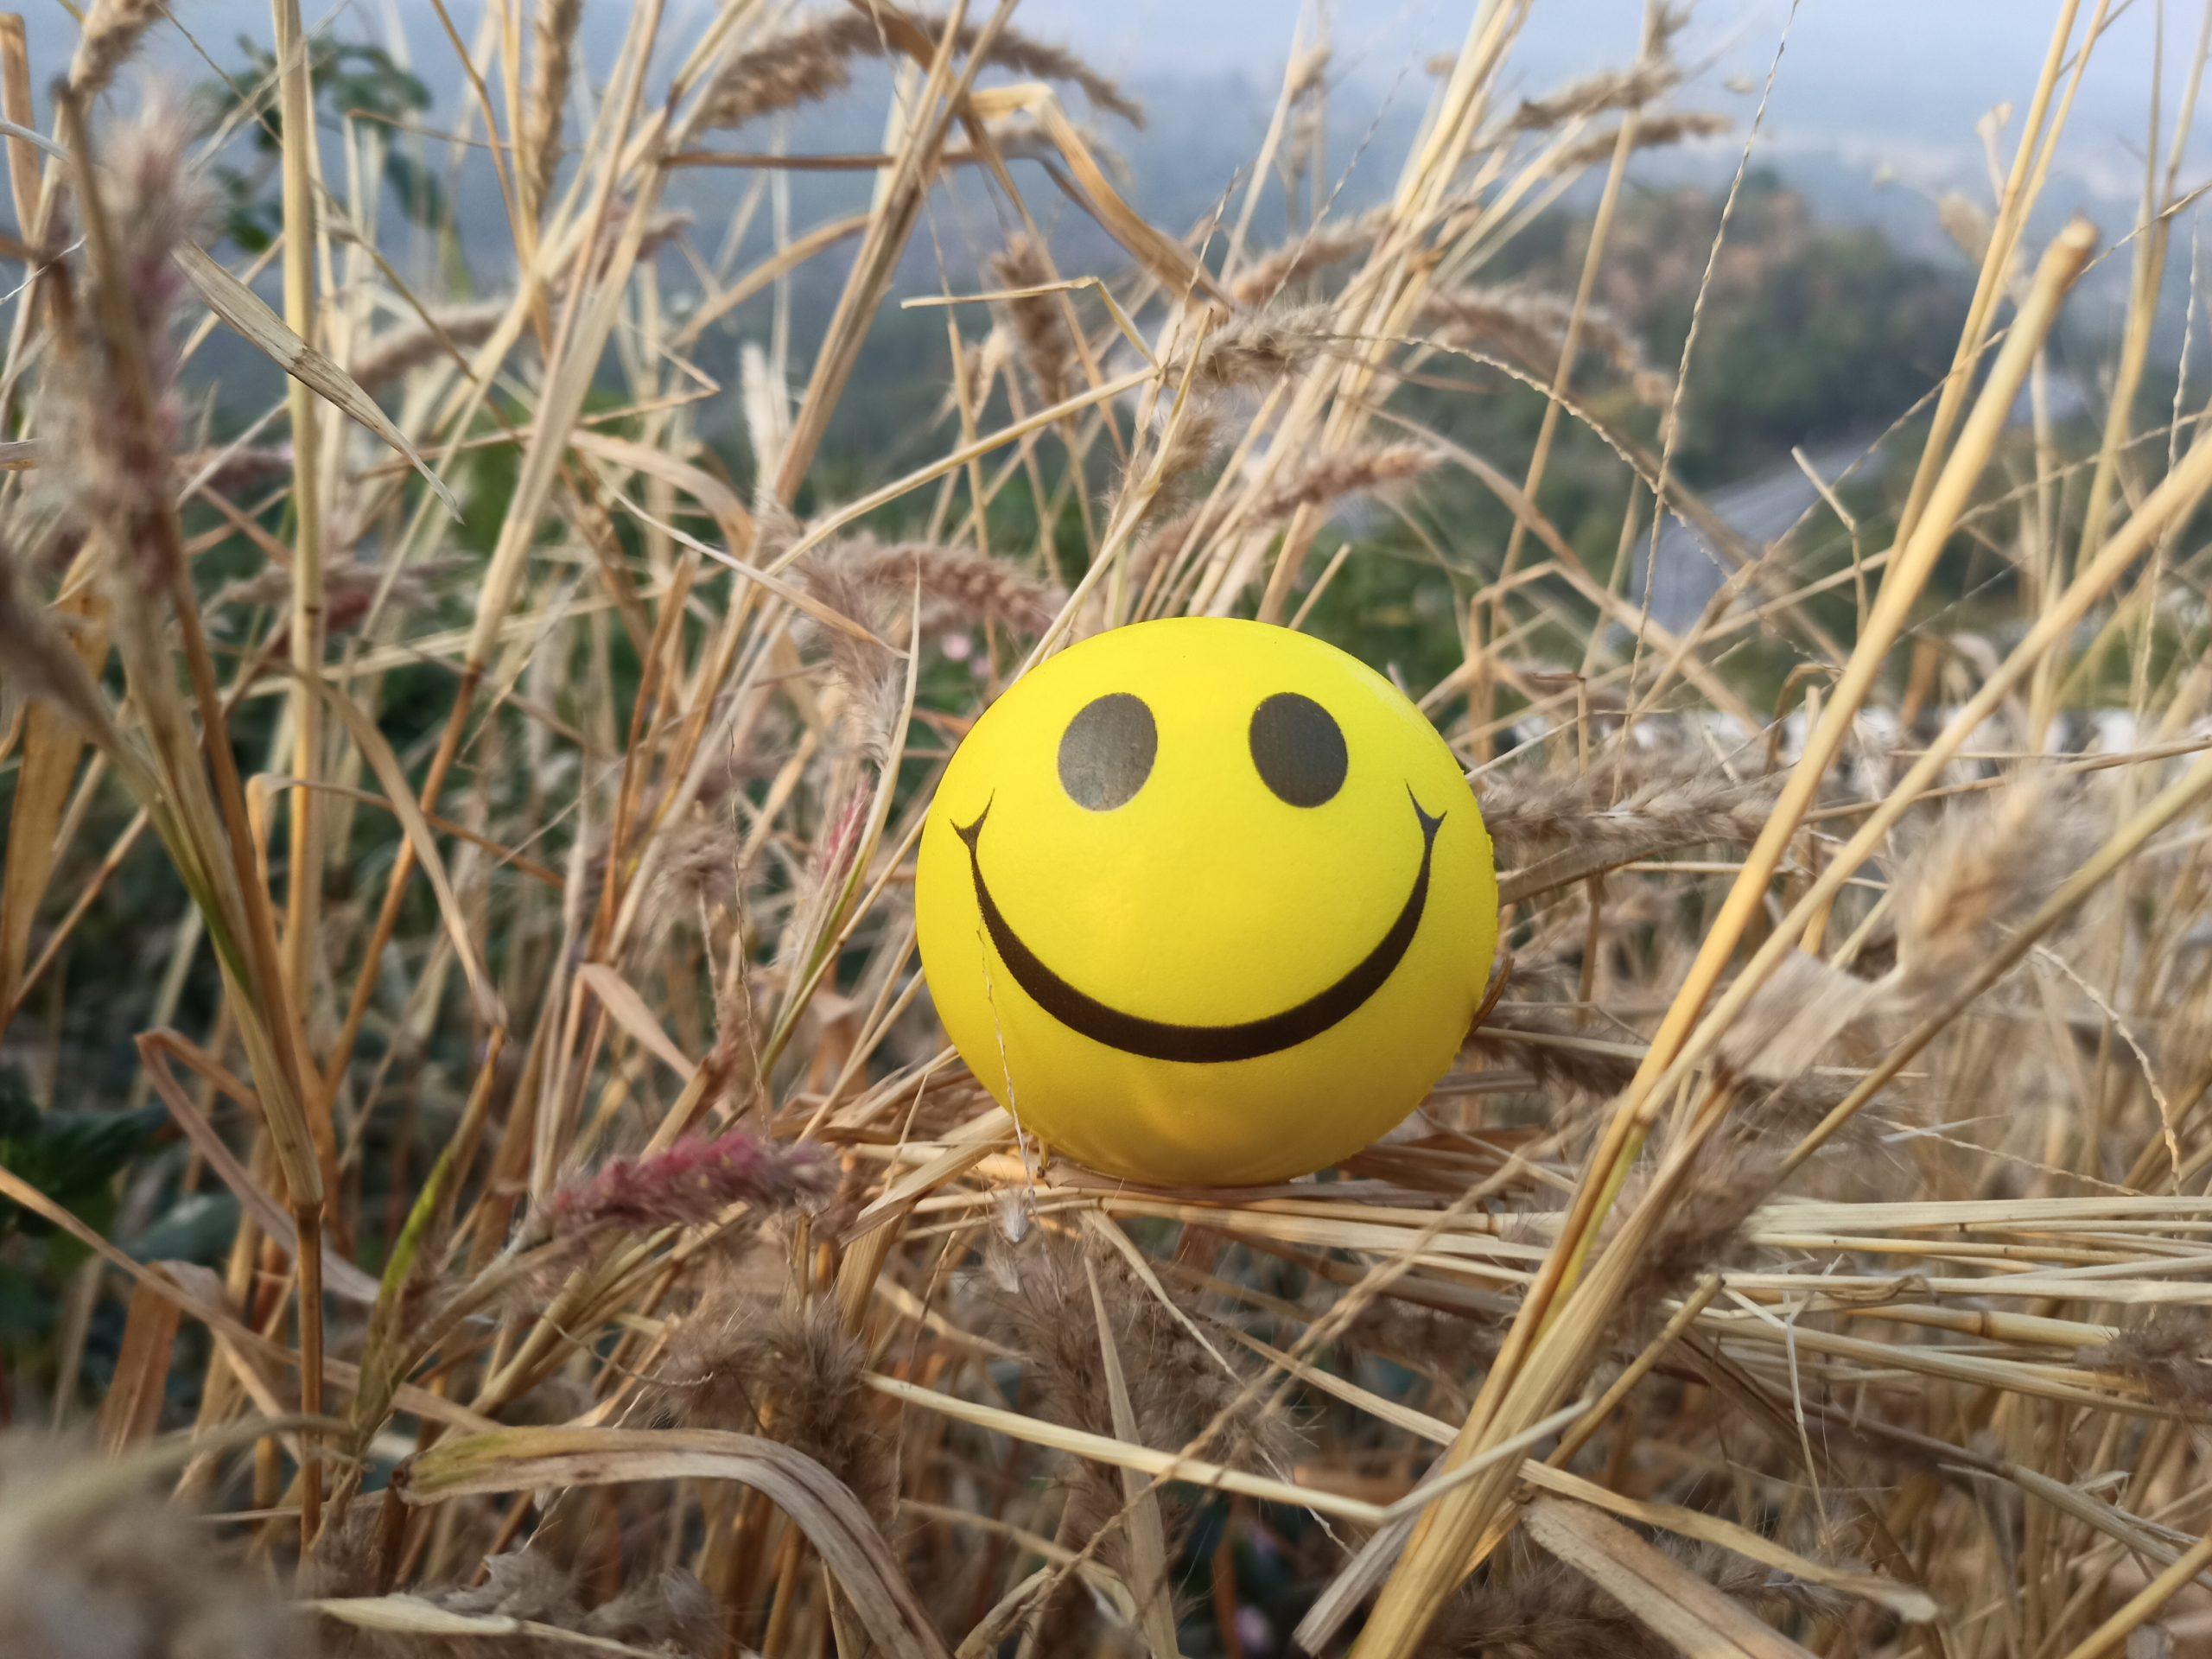 Smiley sponge ball lying in a hay